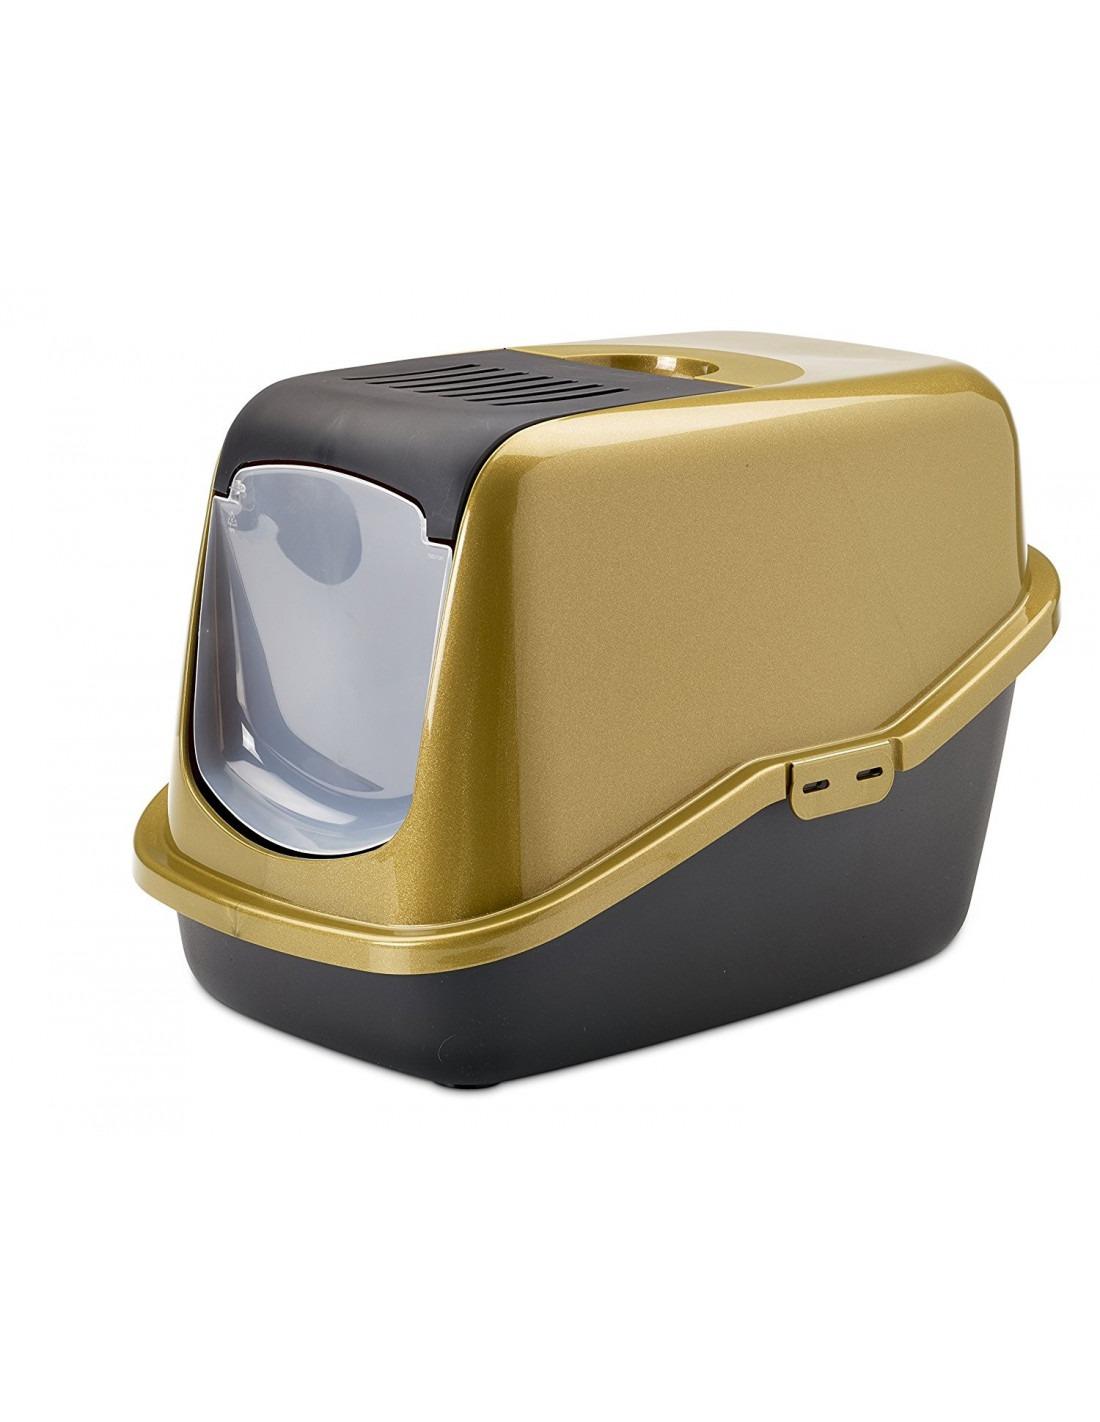 Savic Nestor Cat Toilet Home Glitter Gold Black